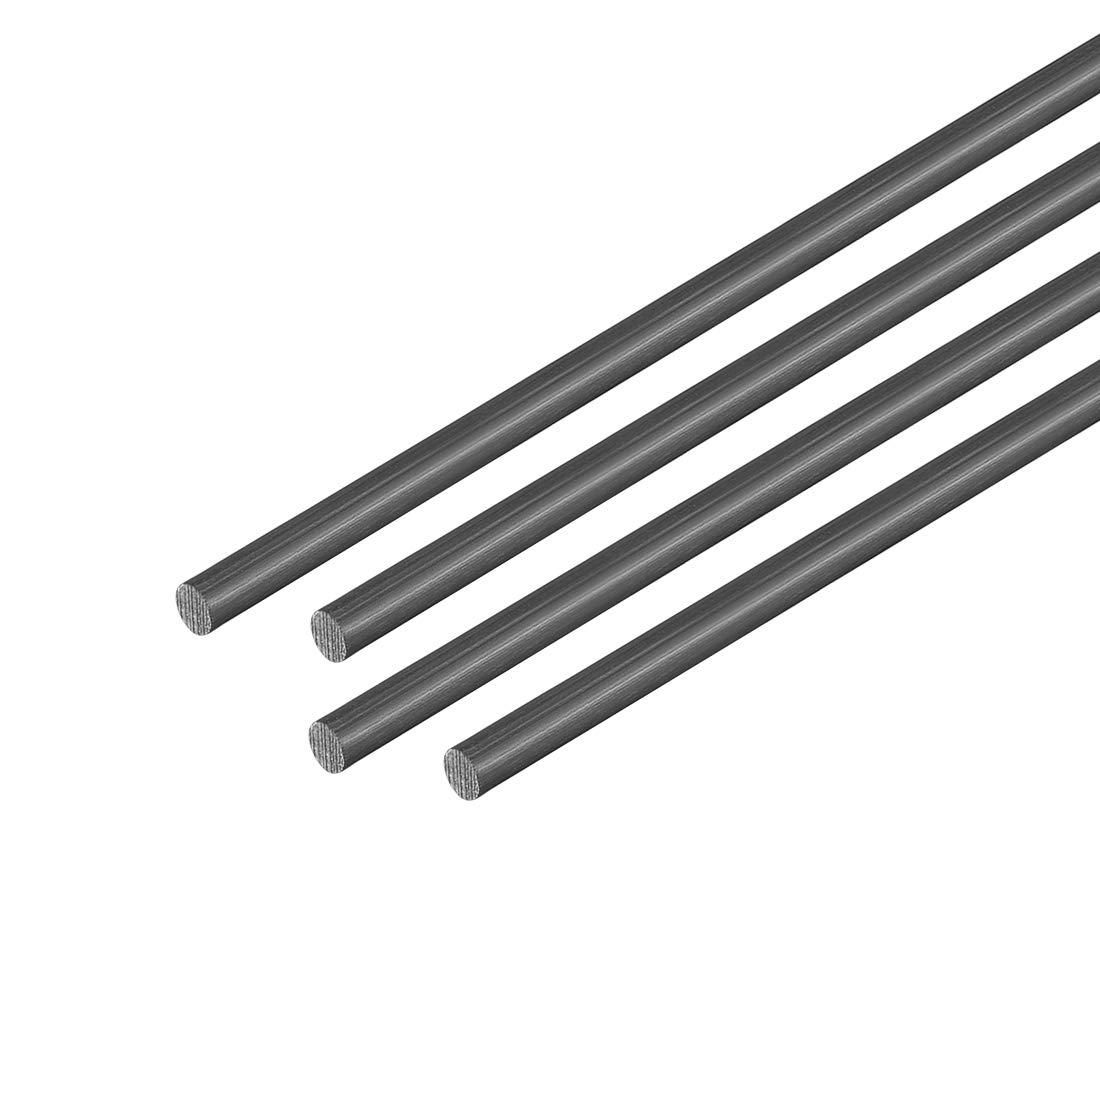 4pcs uxcell Carbon Fiber Rod 3mm 500mm//19.6inch Length Carbon Fiber Round Rod for RC Airplane Matte Pole